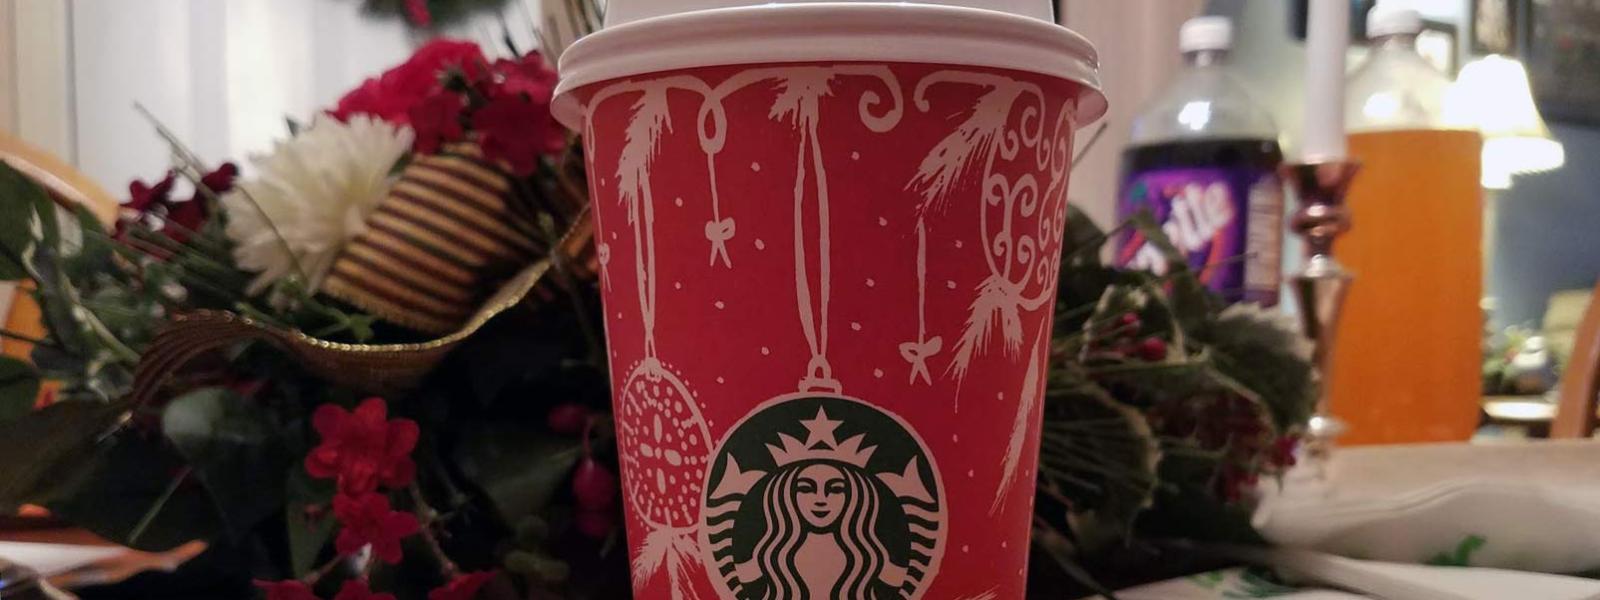 Starbucks Peppermint Hot Chocolate